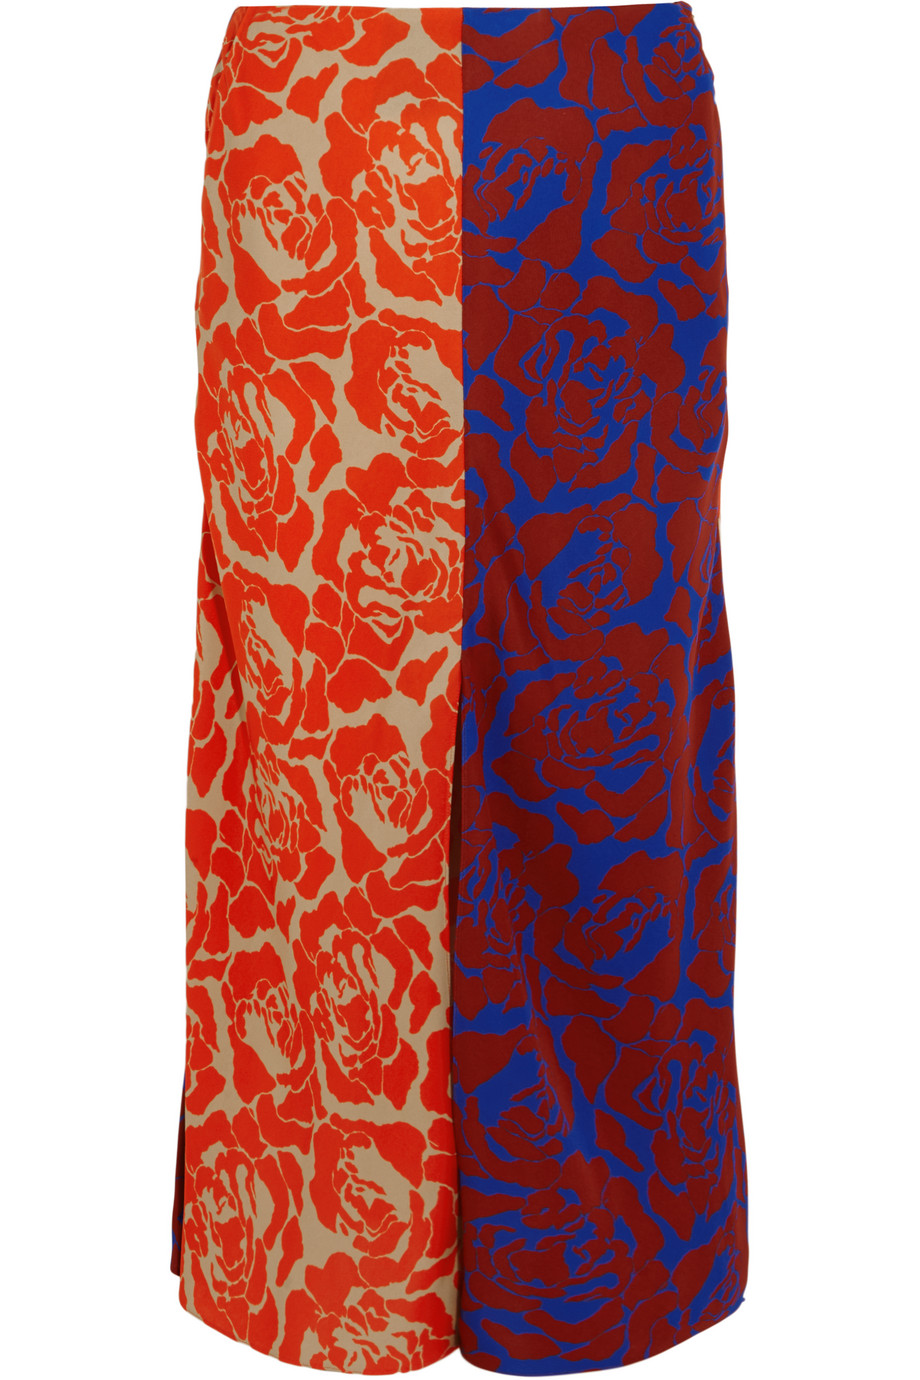 Carine Paneled Printed Crepe Skirt, Jonathan Saunders, Brick/Blue, Women's, Size: 40